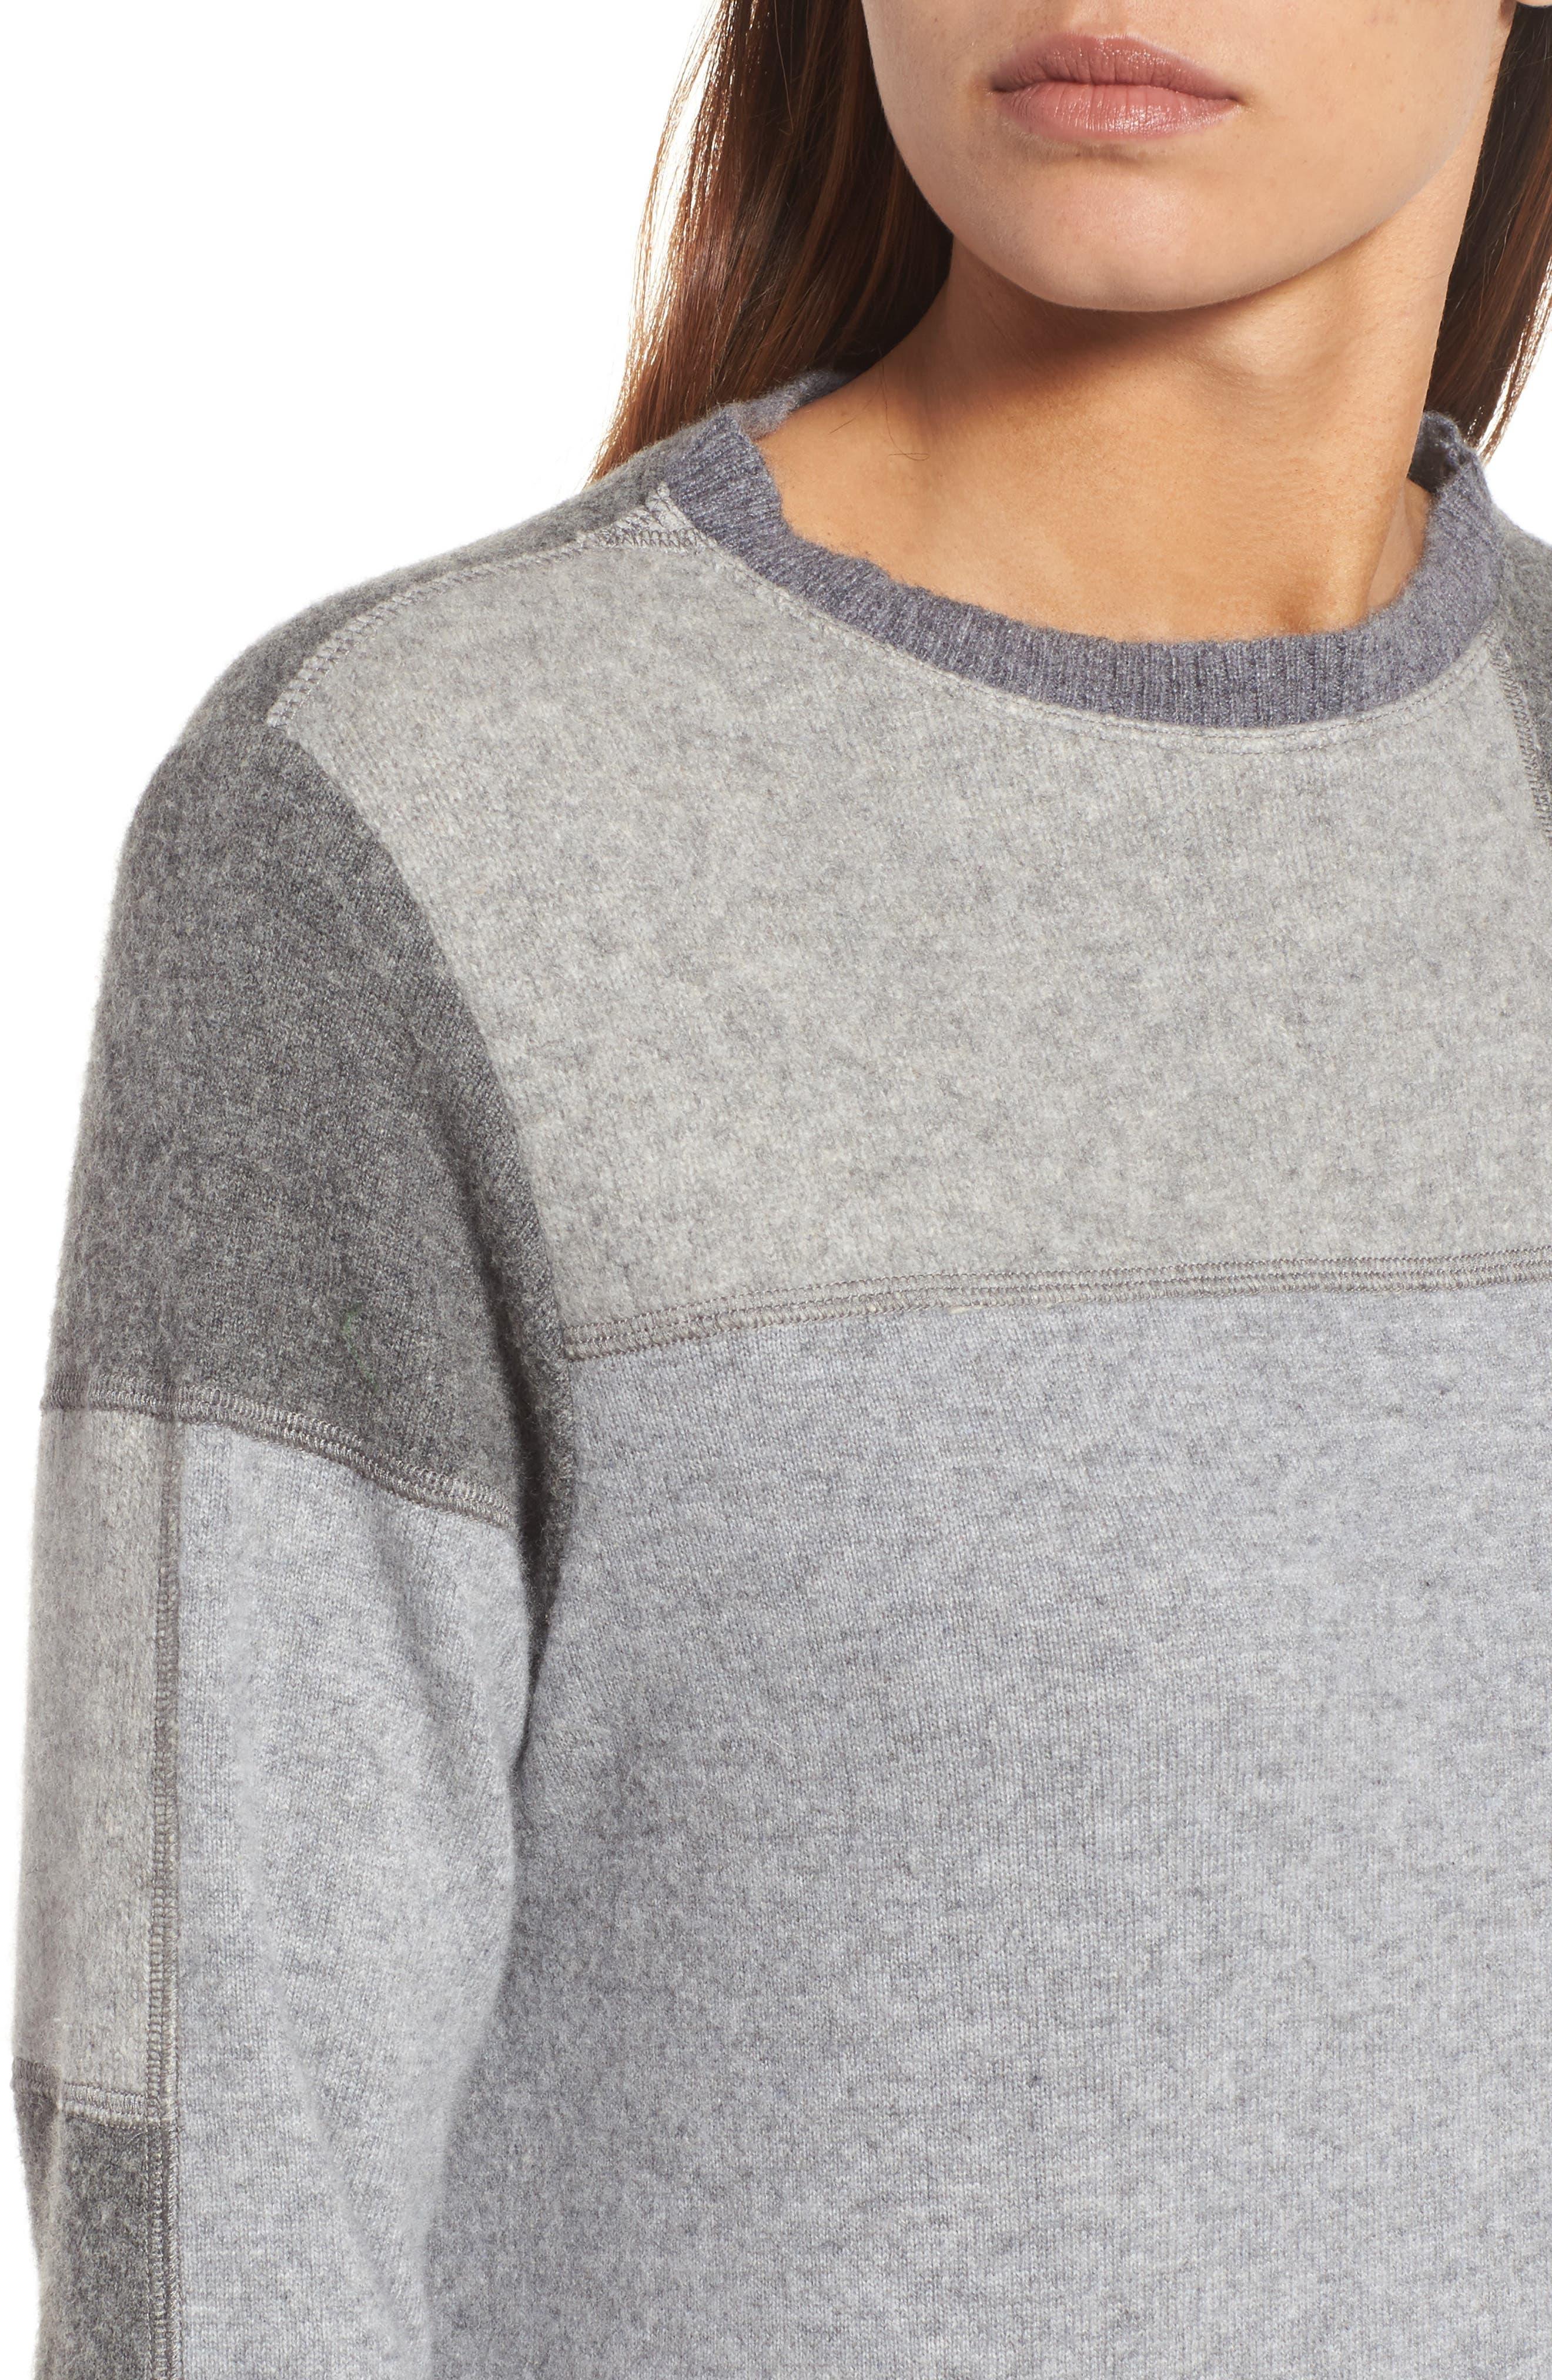 Colorblock Cashmere Sweater,                             Alternate thumbnail 4, color,                             Grey